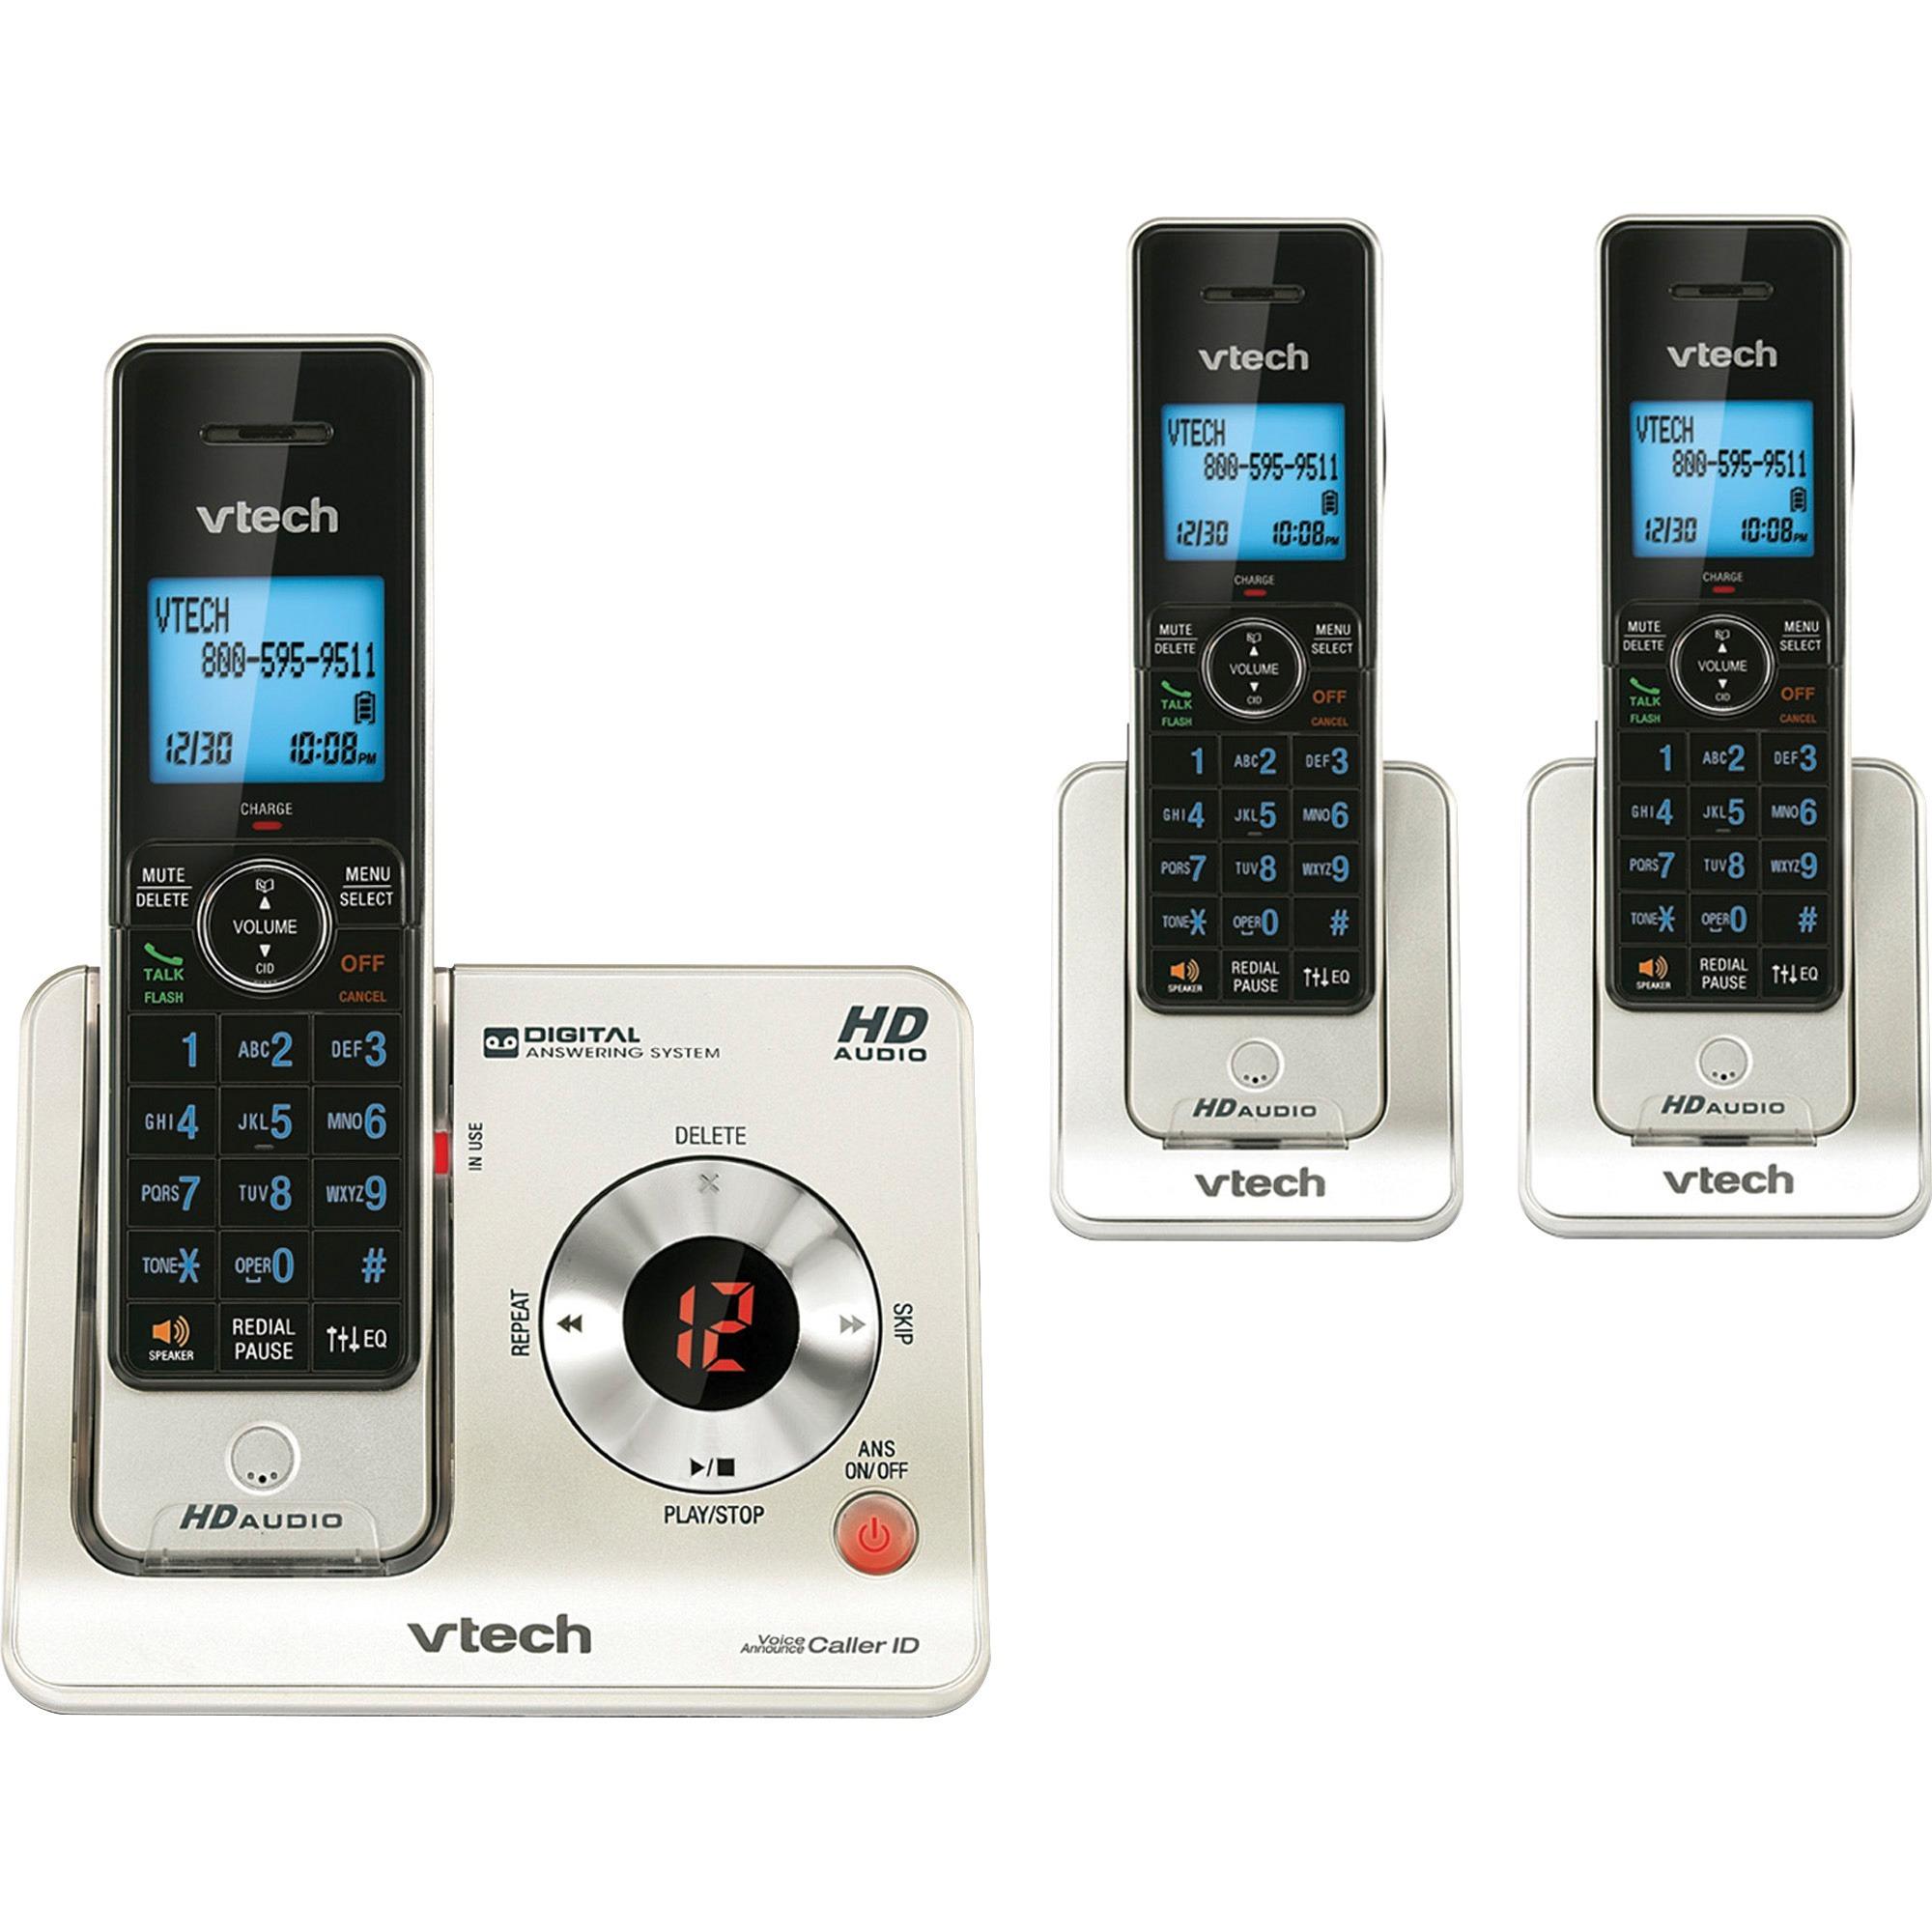 VTech, VTELS64253, Vtech LS64253 Expandable Cordless Telephone, 1, Black